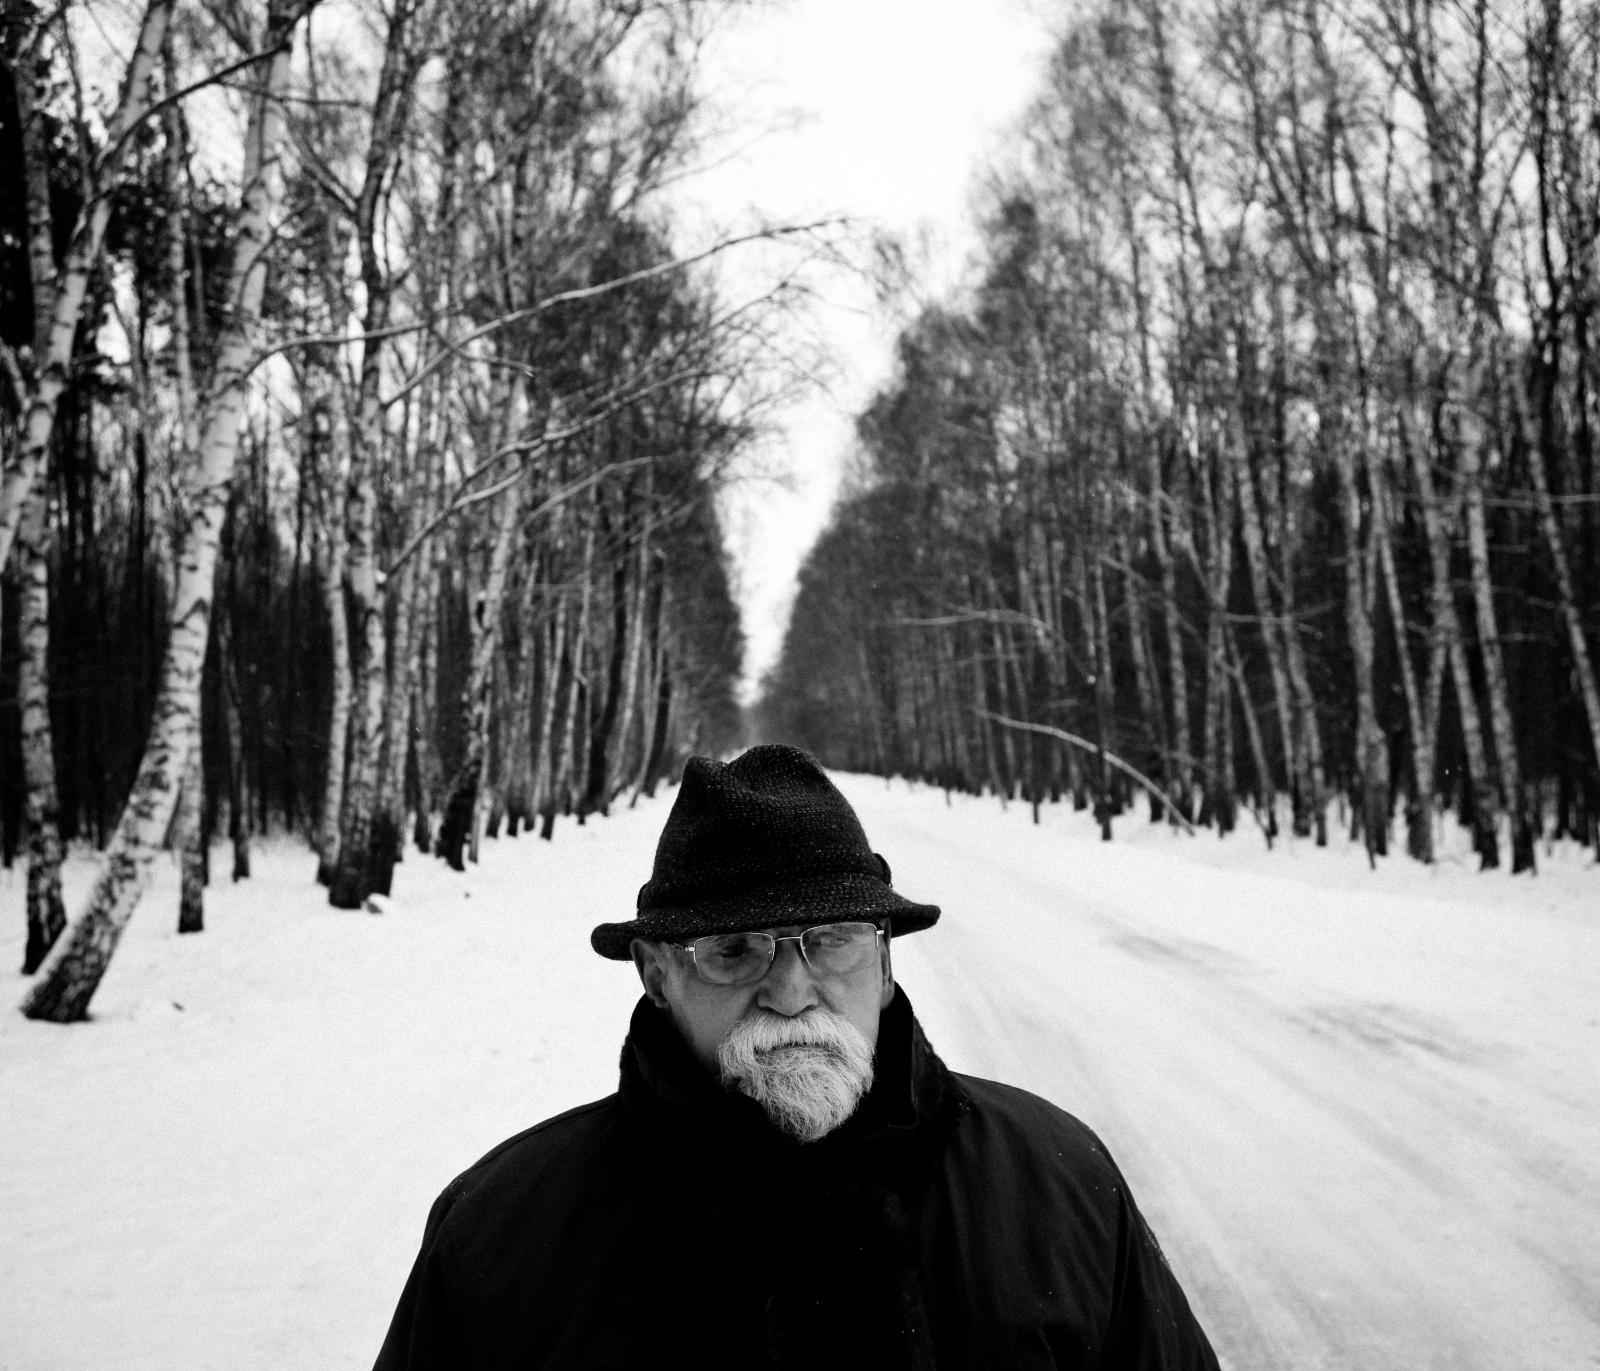 Aleksander Jałosinski, photographer